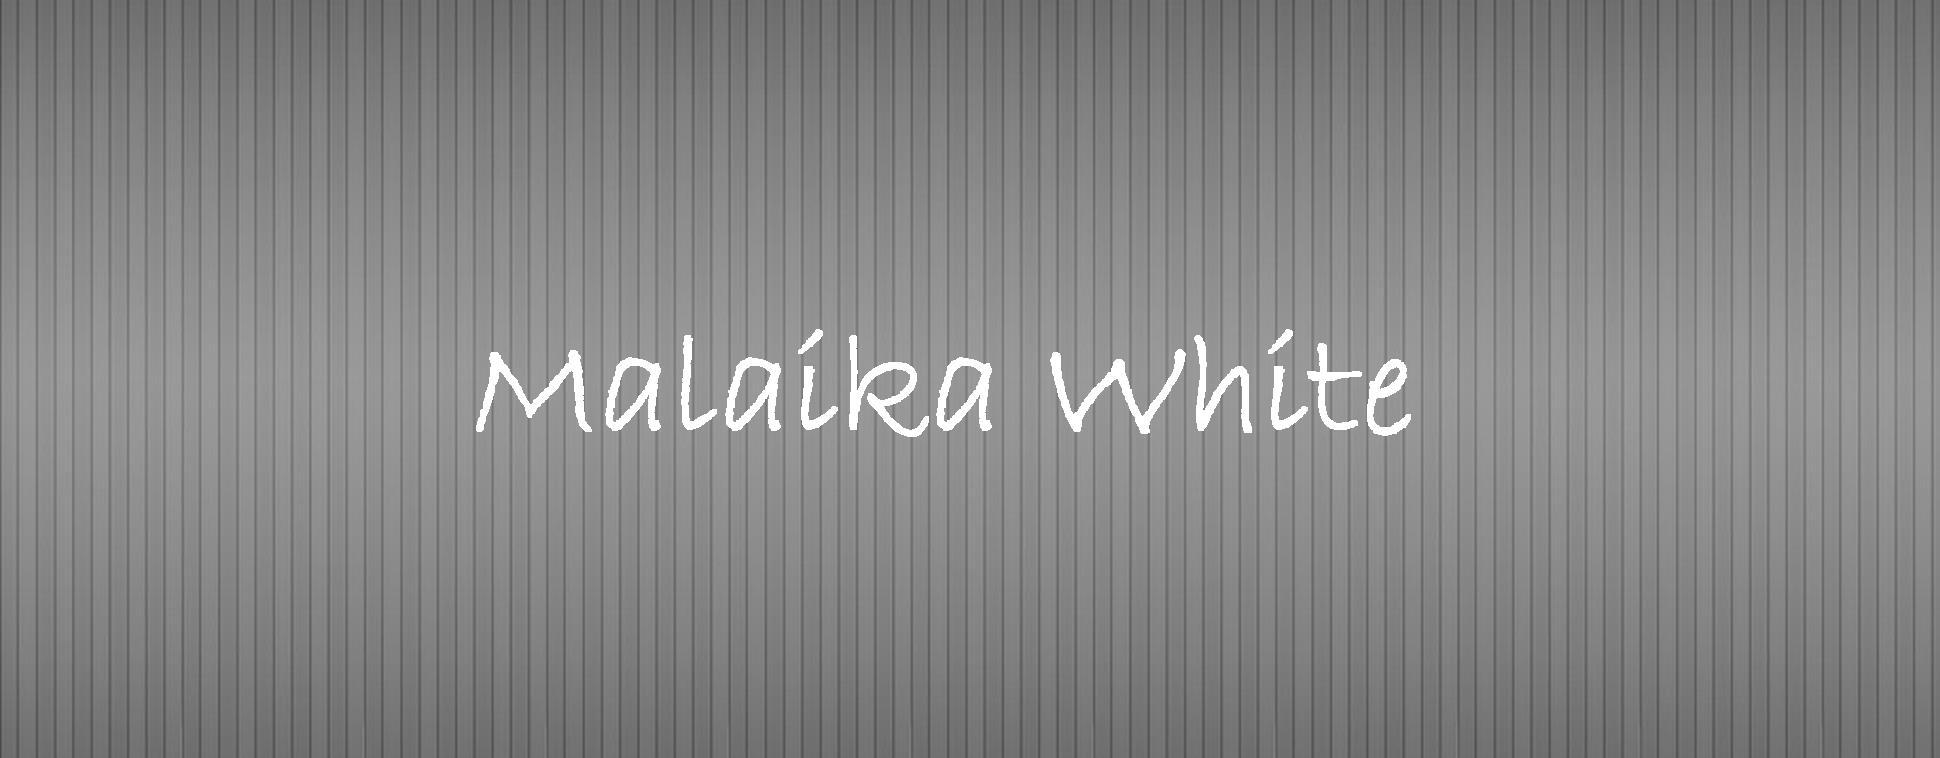 Malaika White.jpg